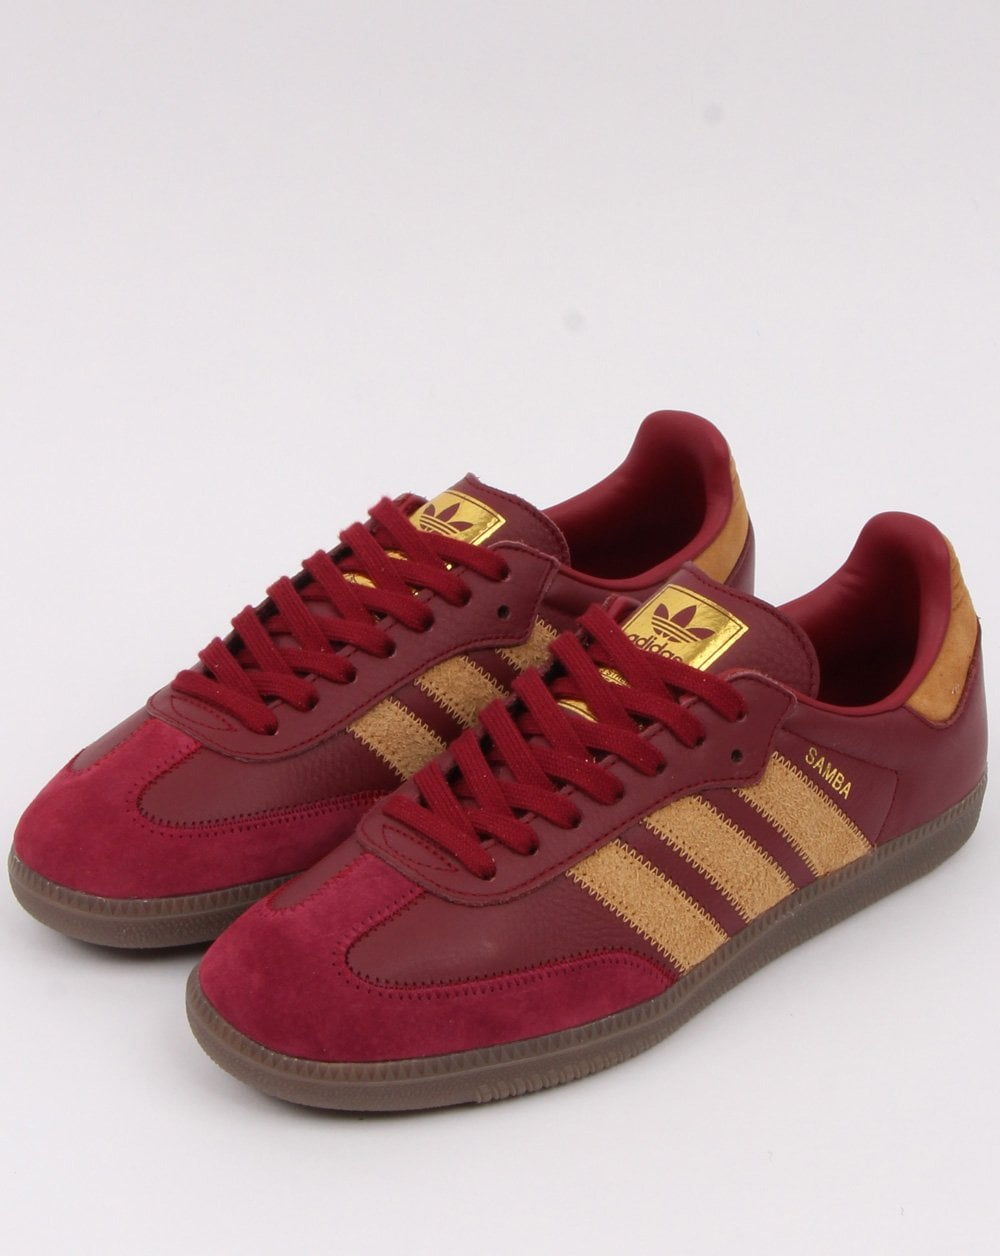 Adidas Samba Og Ft Trainers Burgundy/Gold